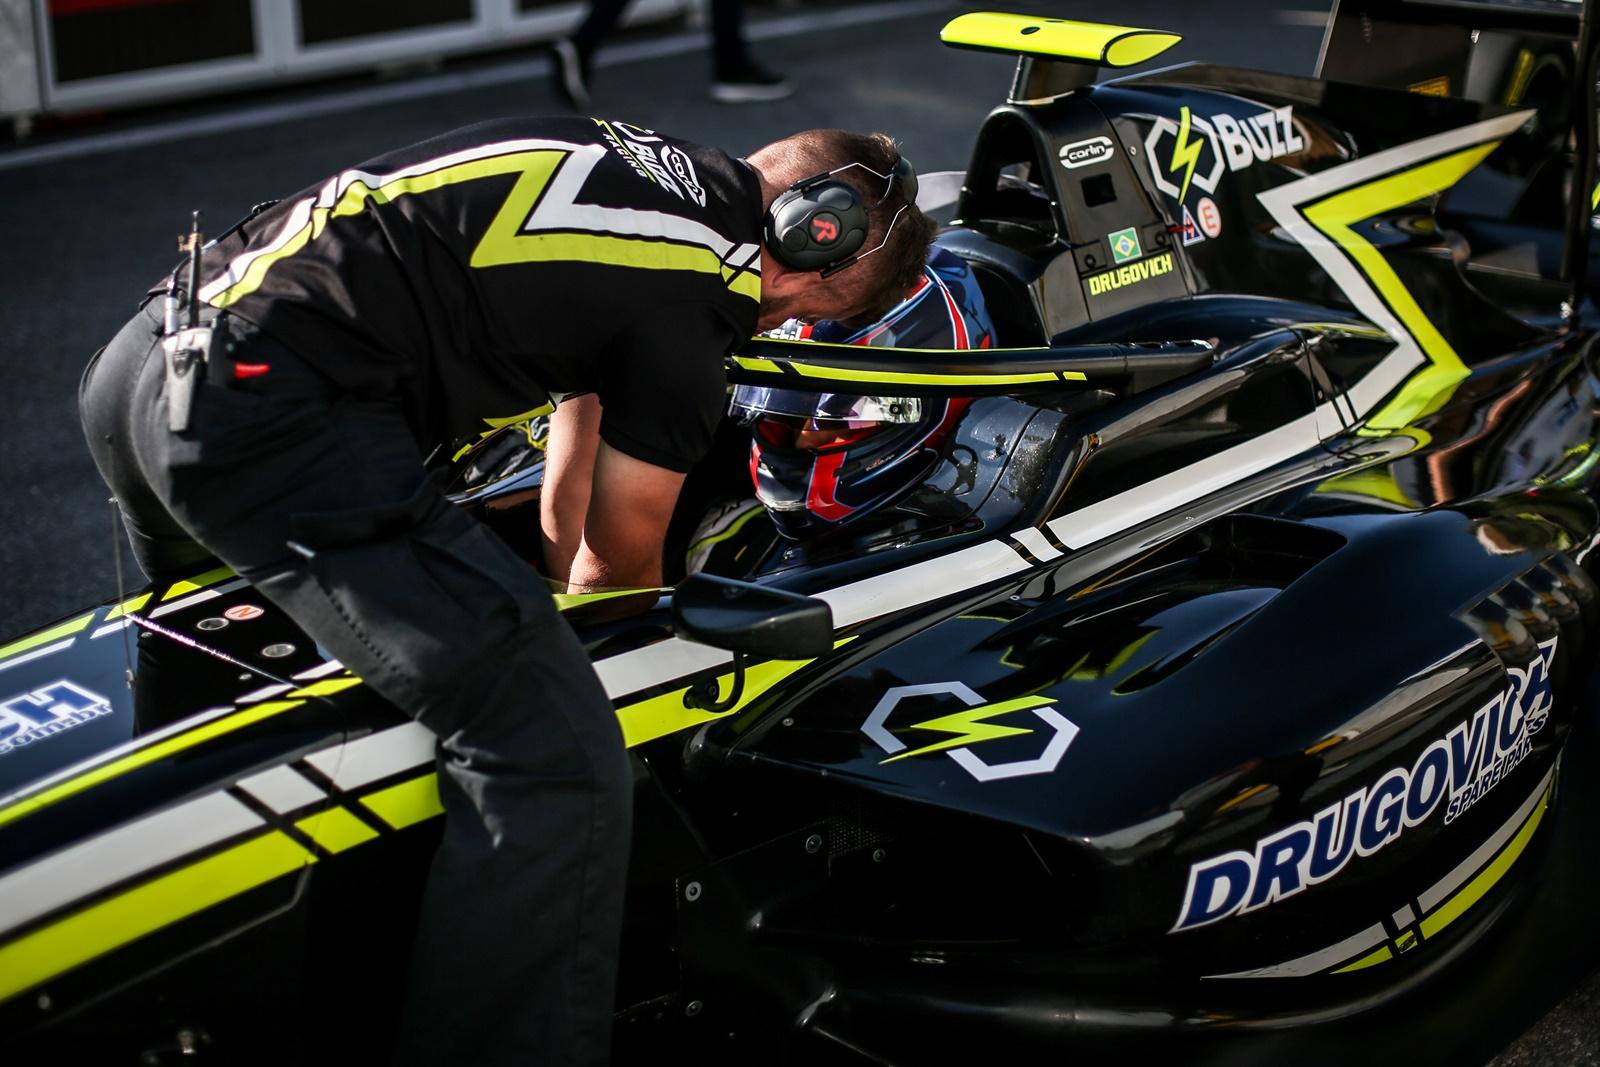 Photo of F3 – Felipe Drugovich teve desempenho positivo na Fórmula 3 FIA em Spa-Francorchamps, na Bélgica